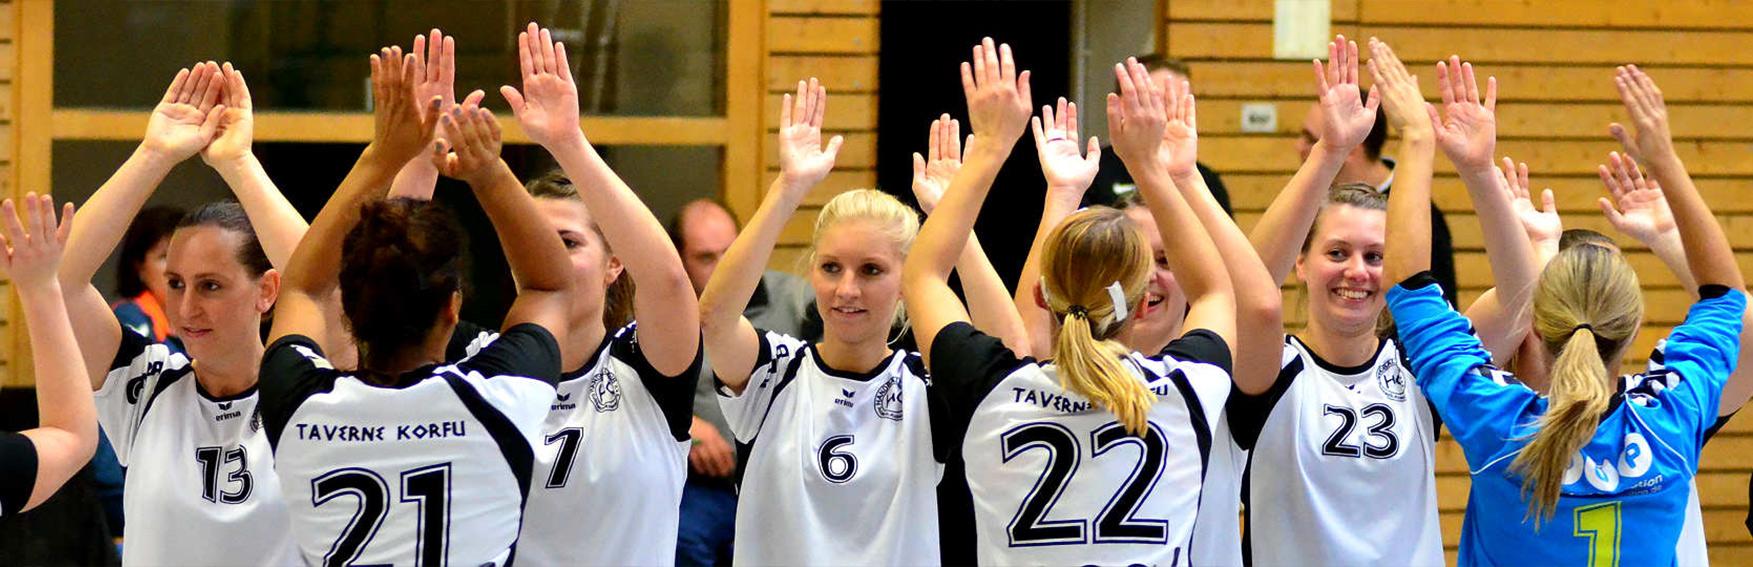 HC-Sulzbach-Handball-Damen